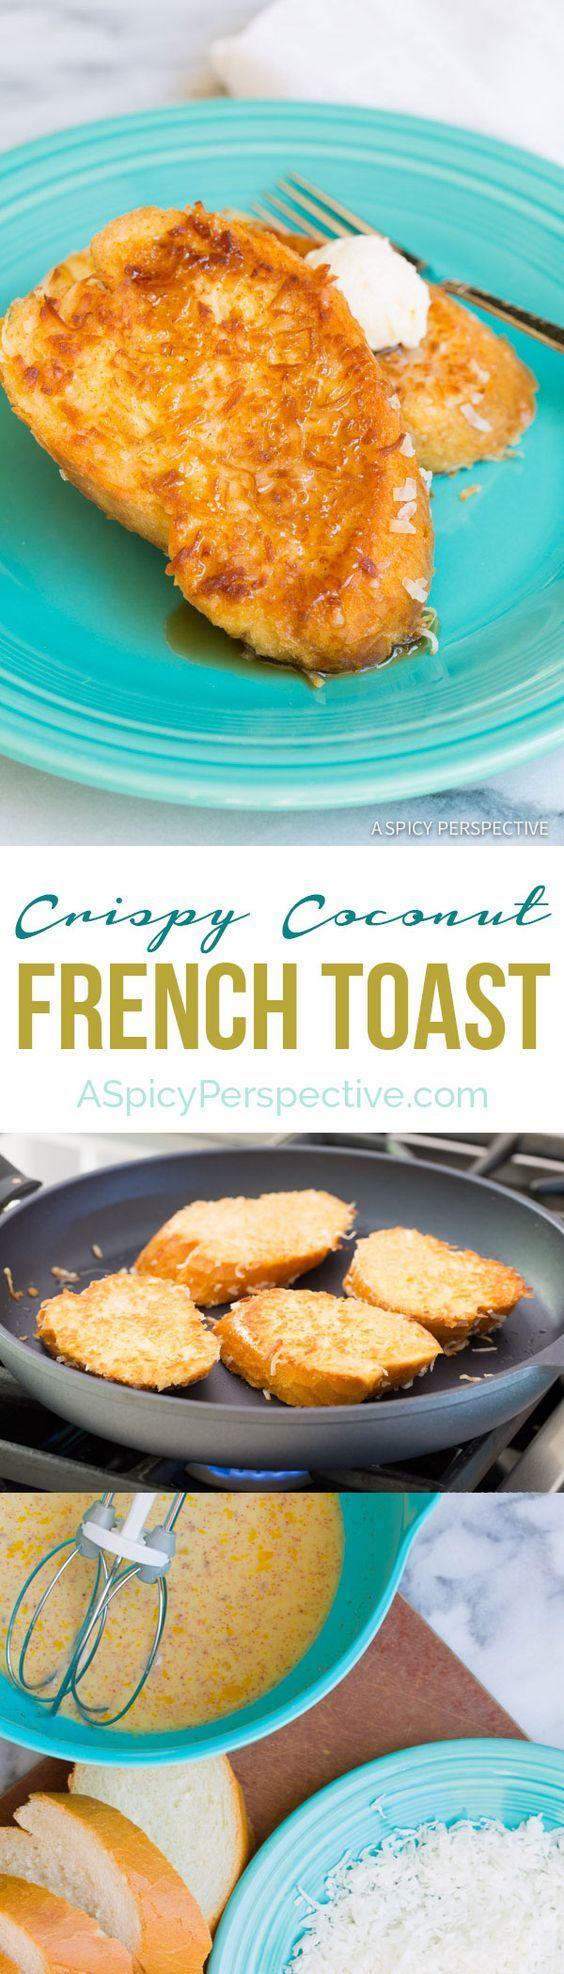 Crispy Decadent Coconut French Toast onCrispy Decadent Coconut French Toast onASpicyPerspective...Crispy Decadent Coconut French Toast onCrispy Decadent Coconut French Toast onASpicyPerspective...